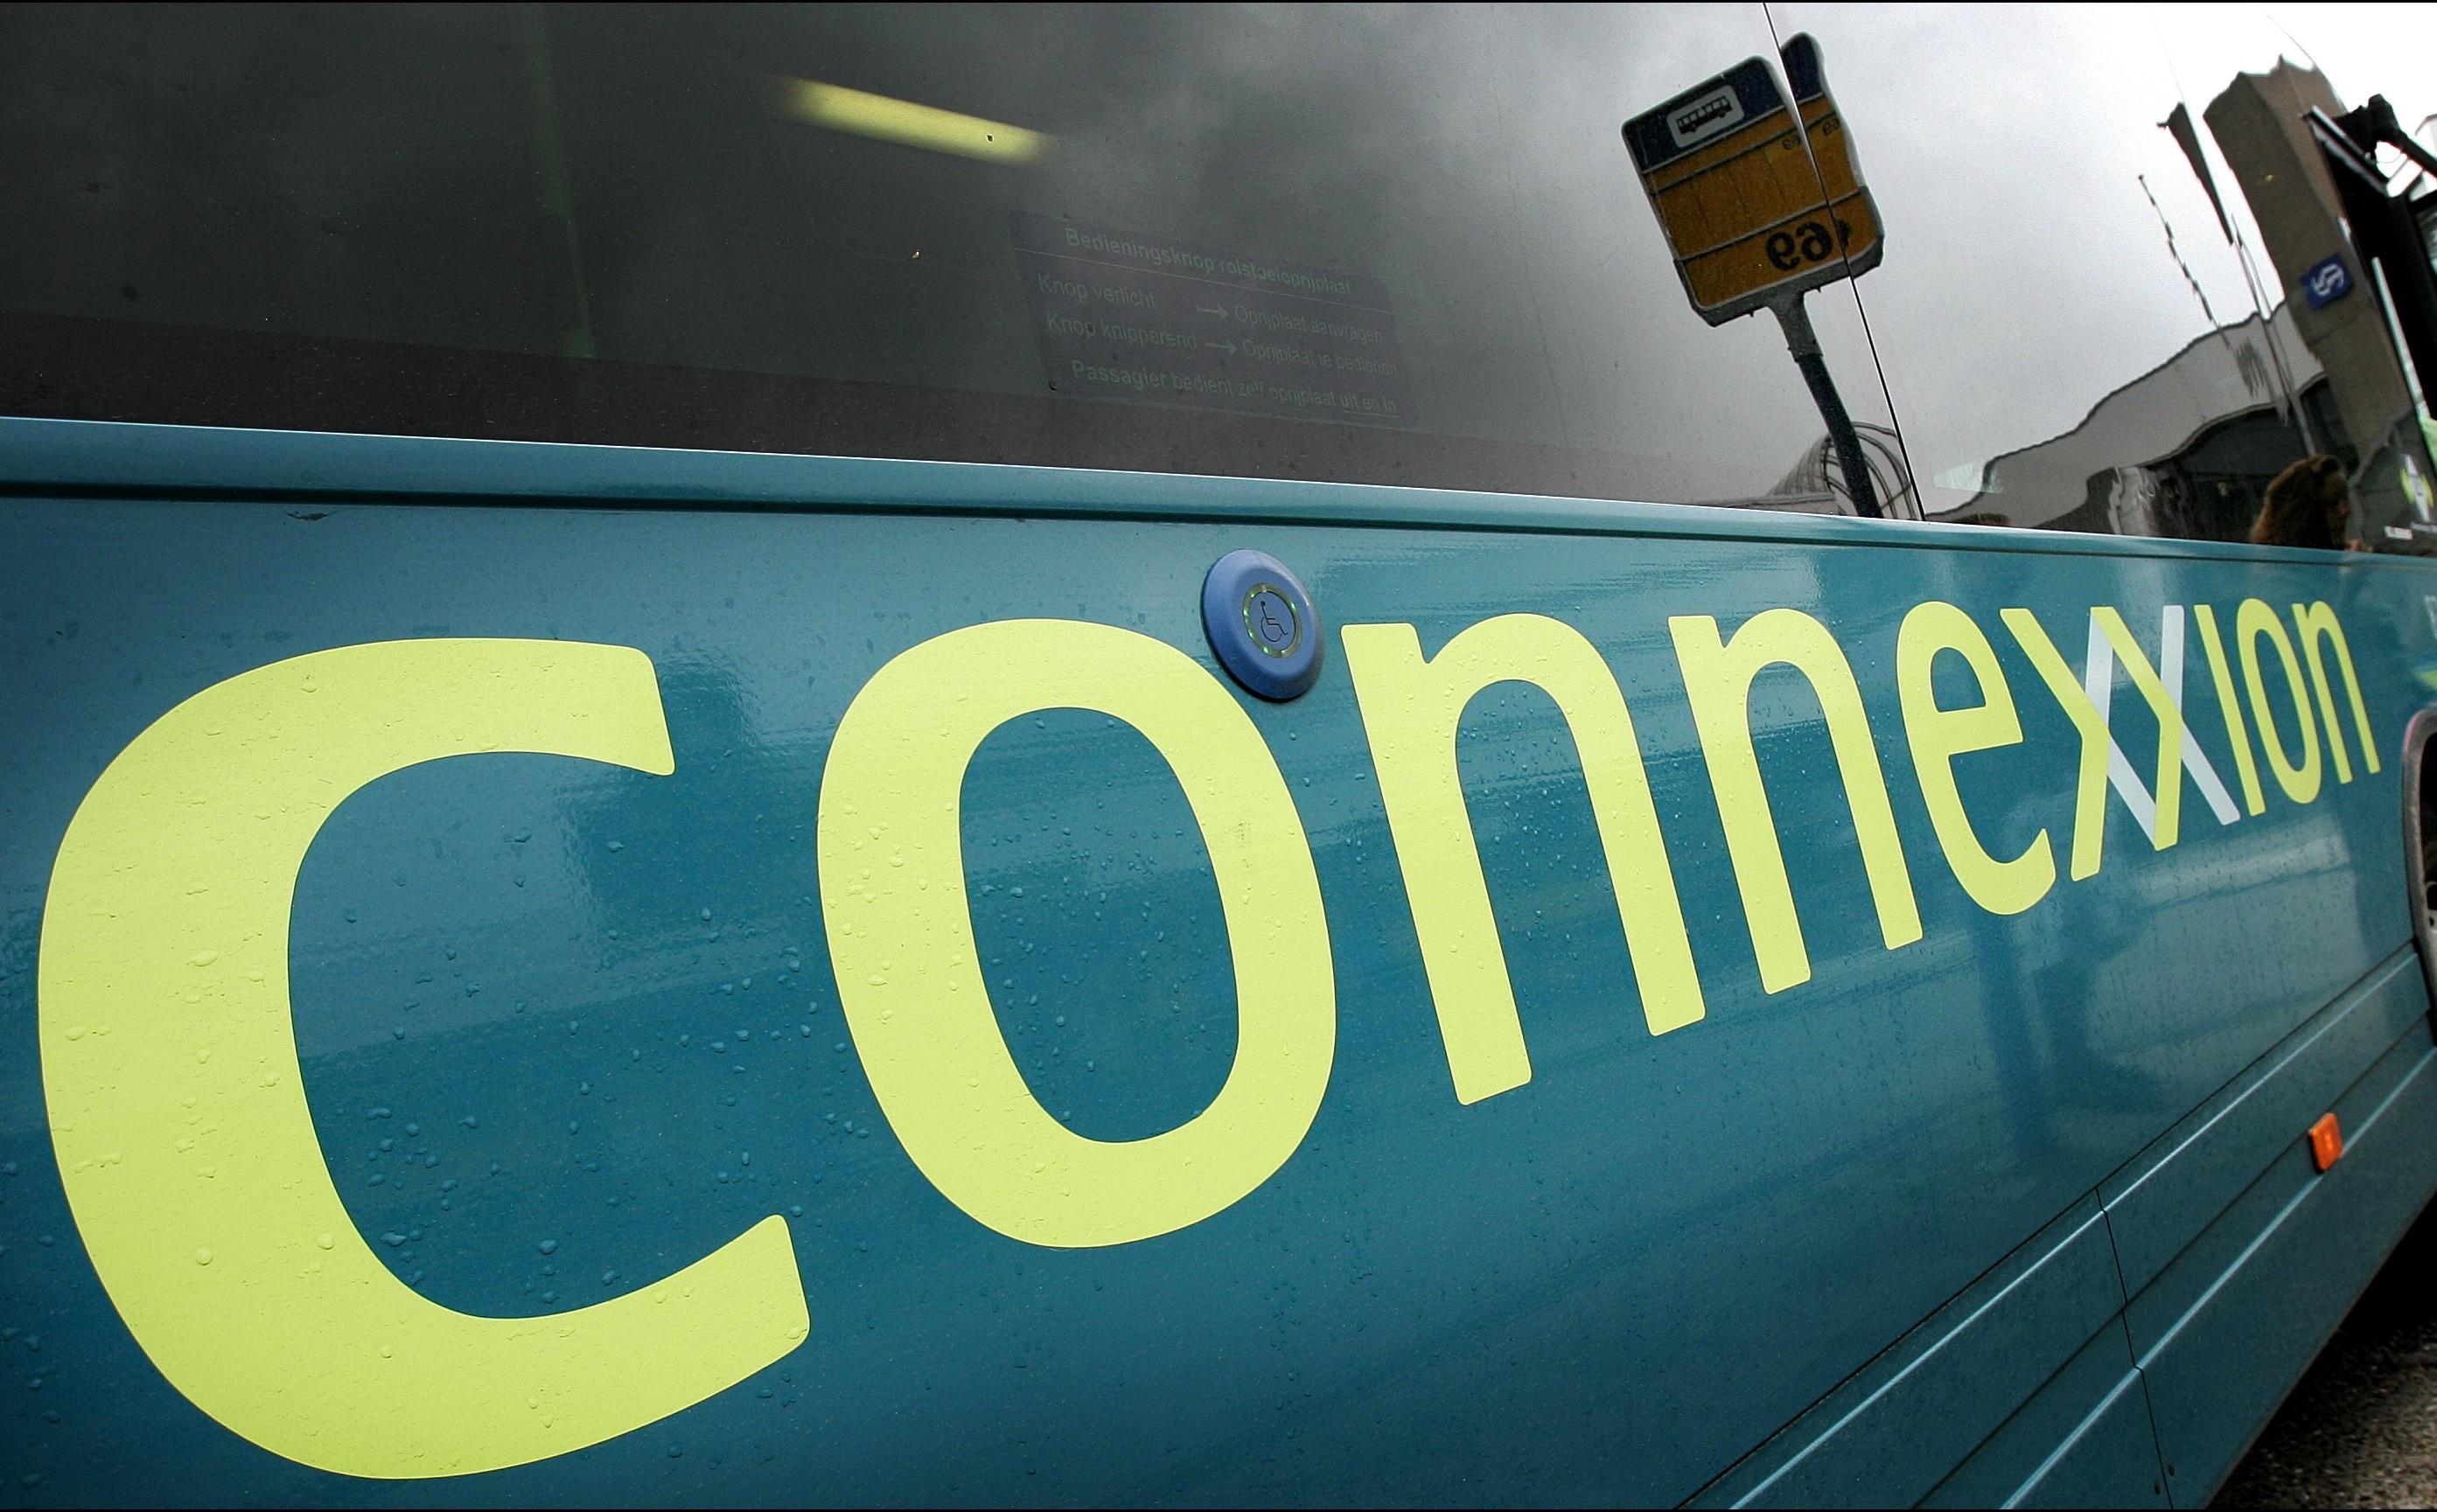 Streekvervoerder Connexxion neemt in Noord-Holland 60 chauffeurs en 10 bussen van failliete onderaannemer TCR over